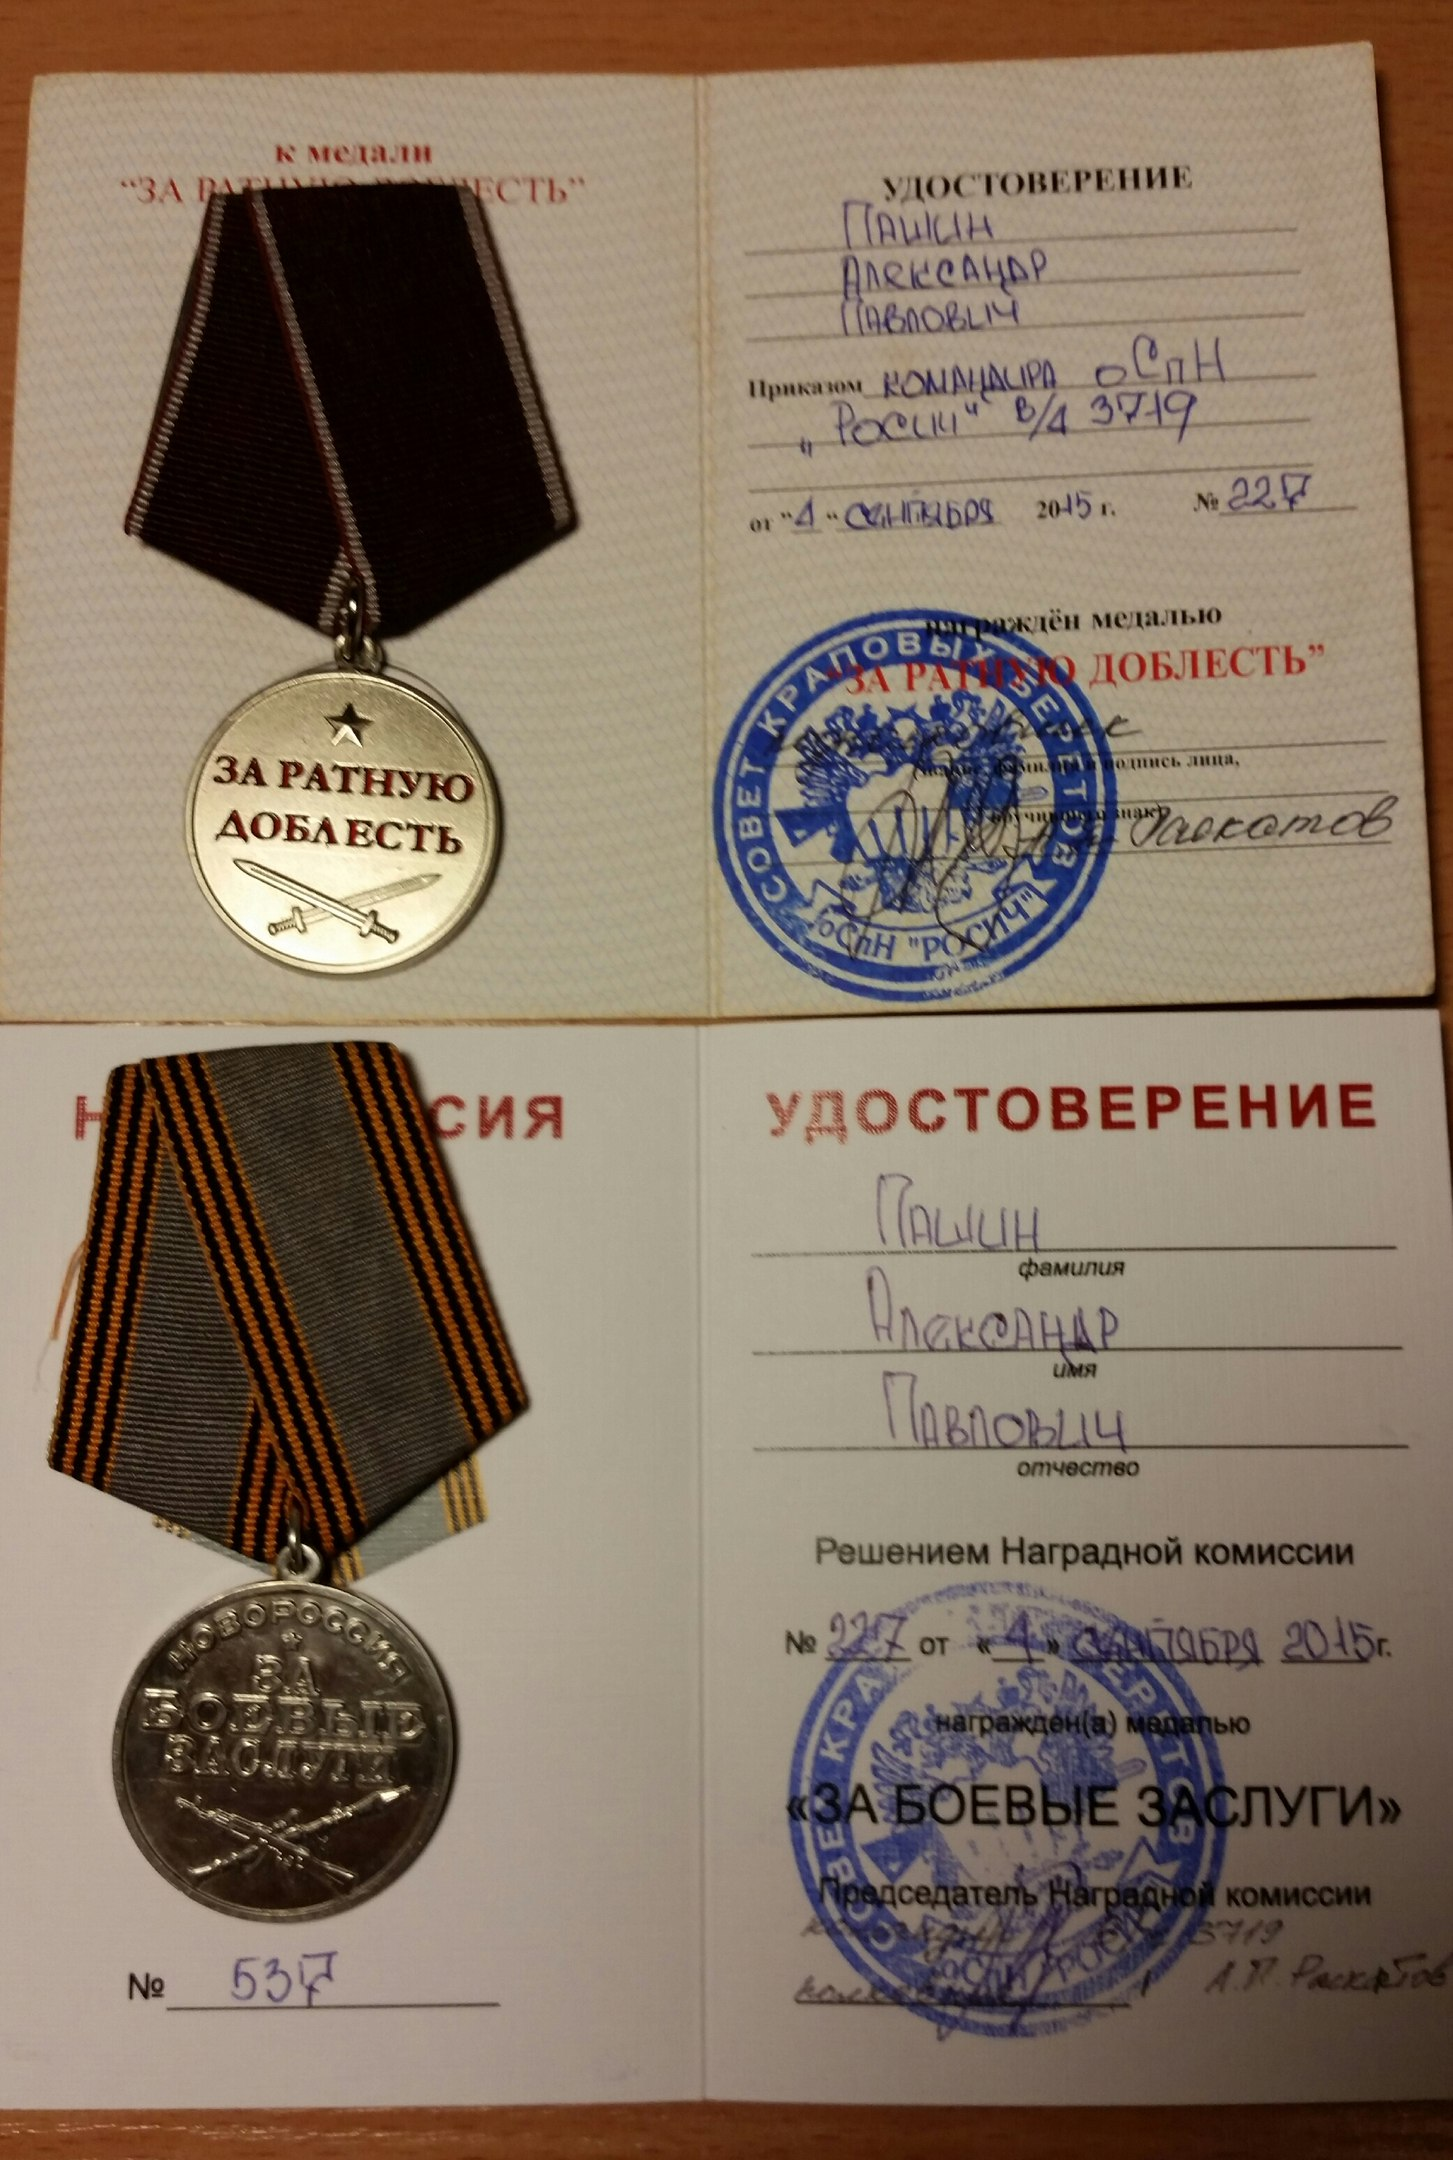 Alexander Pashin: kashalot74@mail.ru